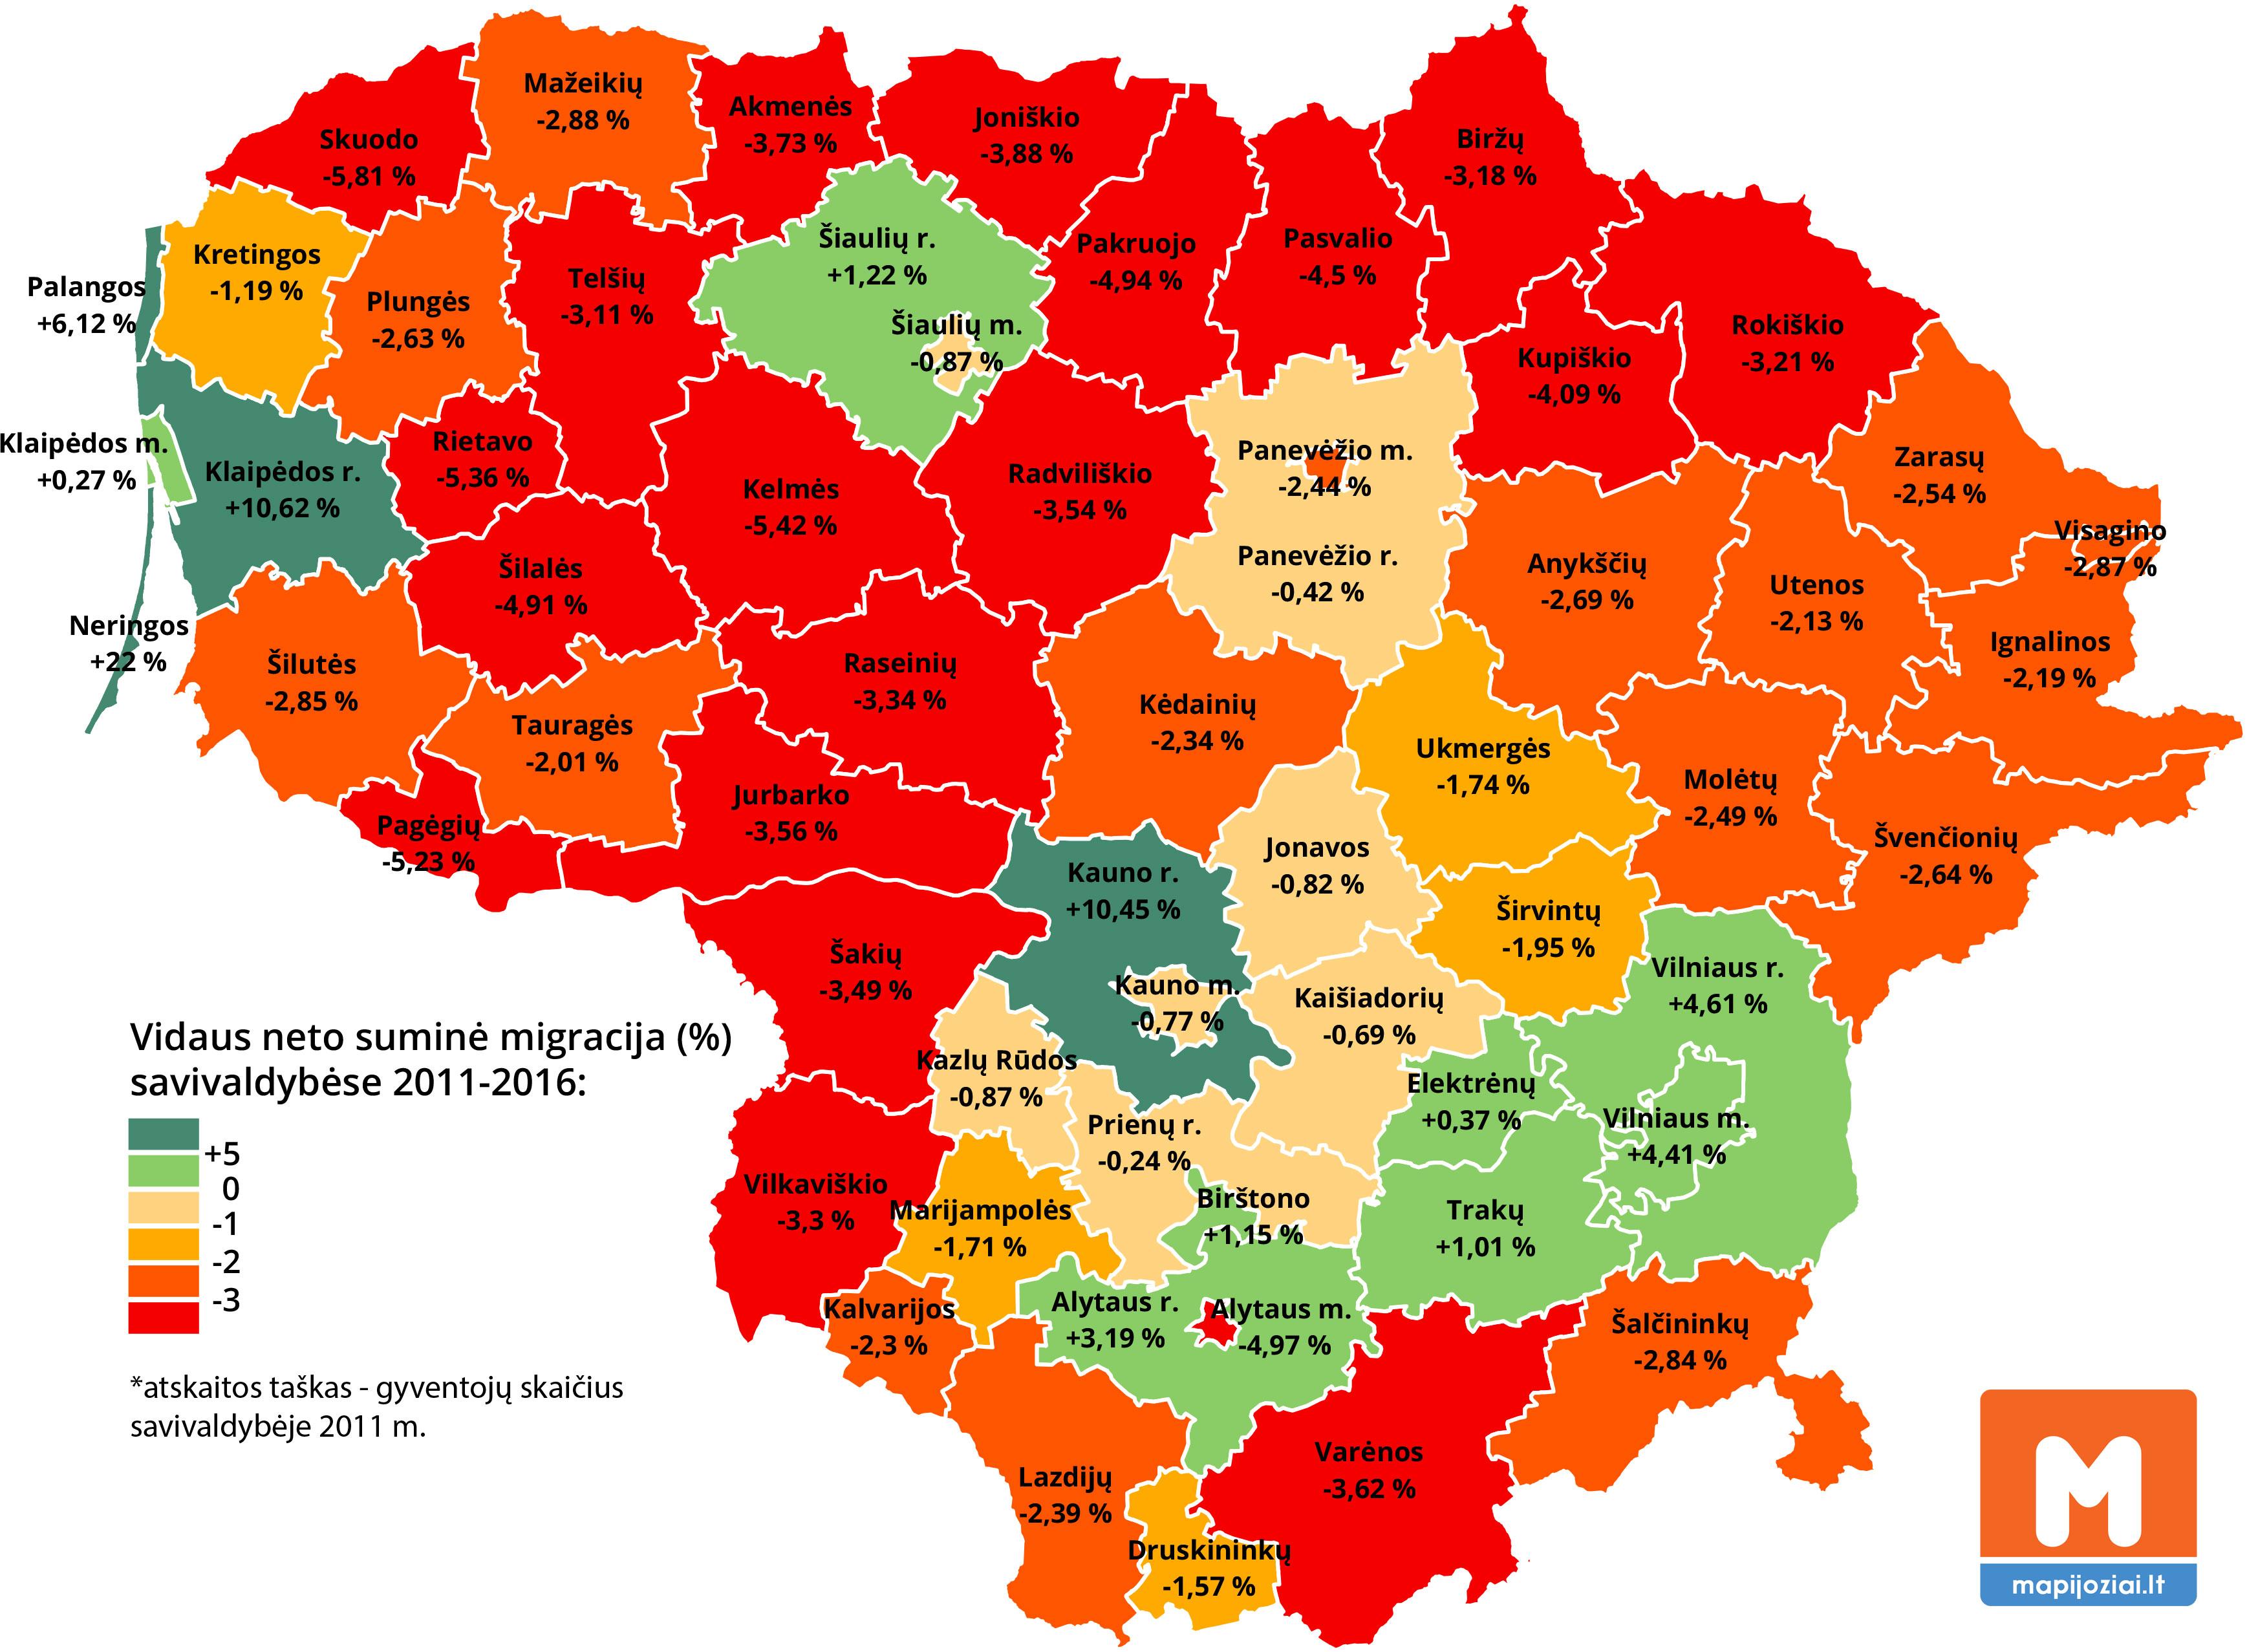 Vidaus migracija Lietuvoje